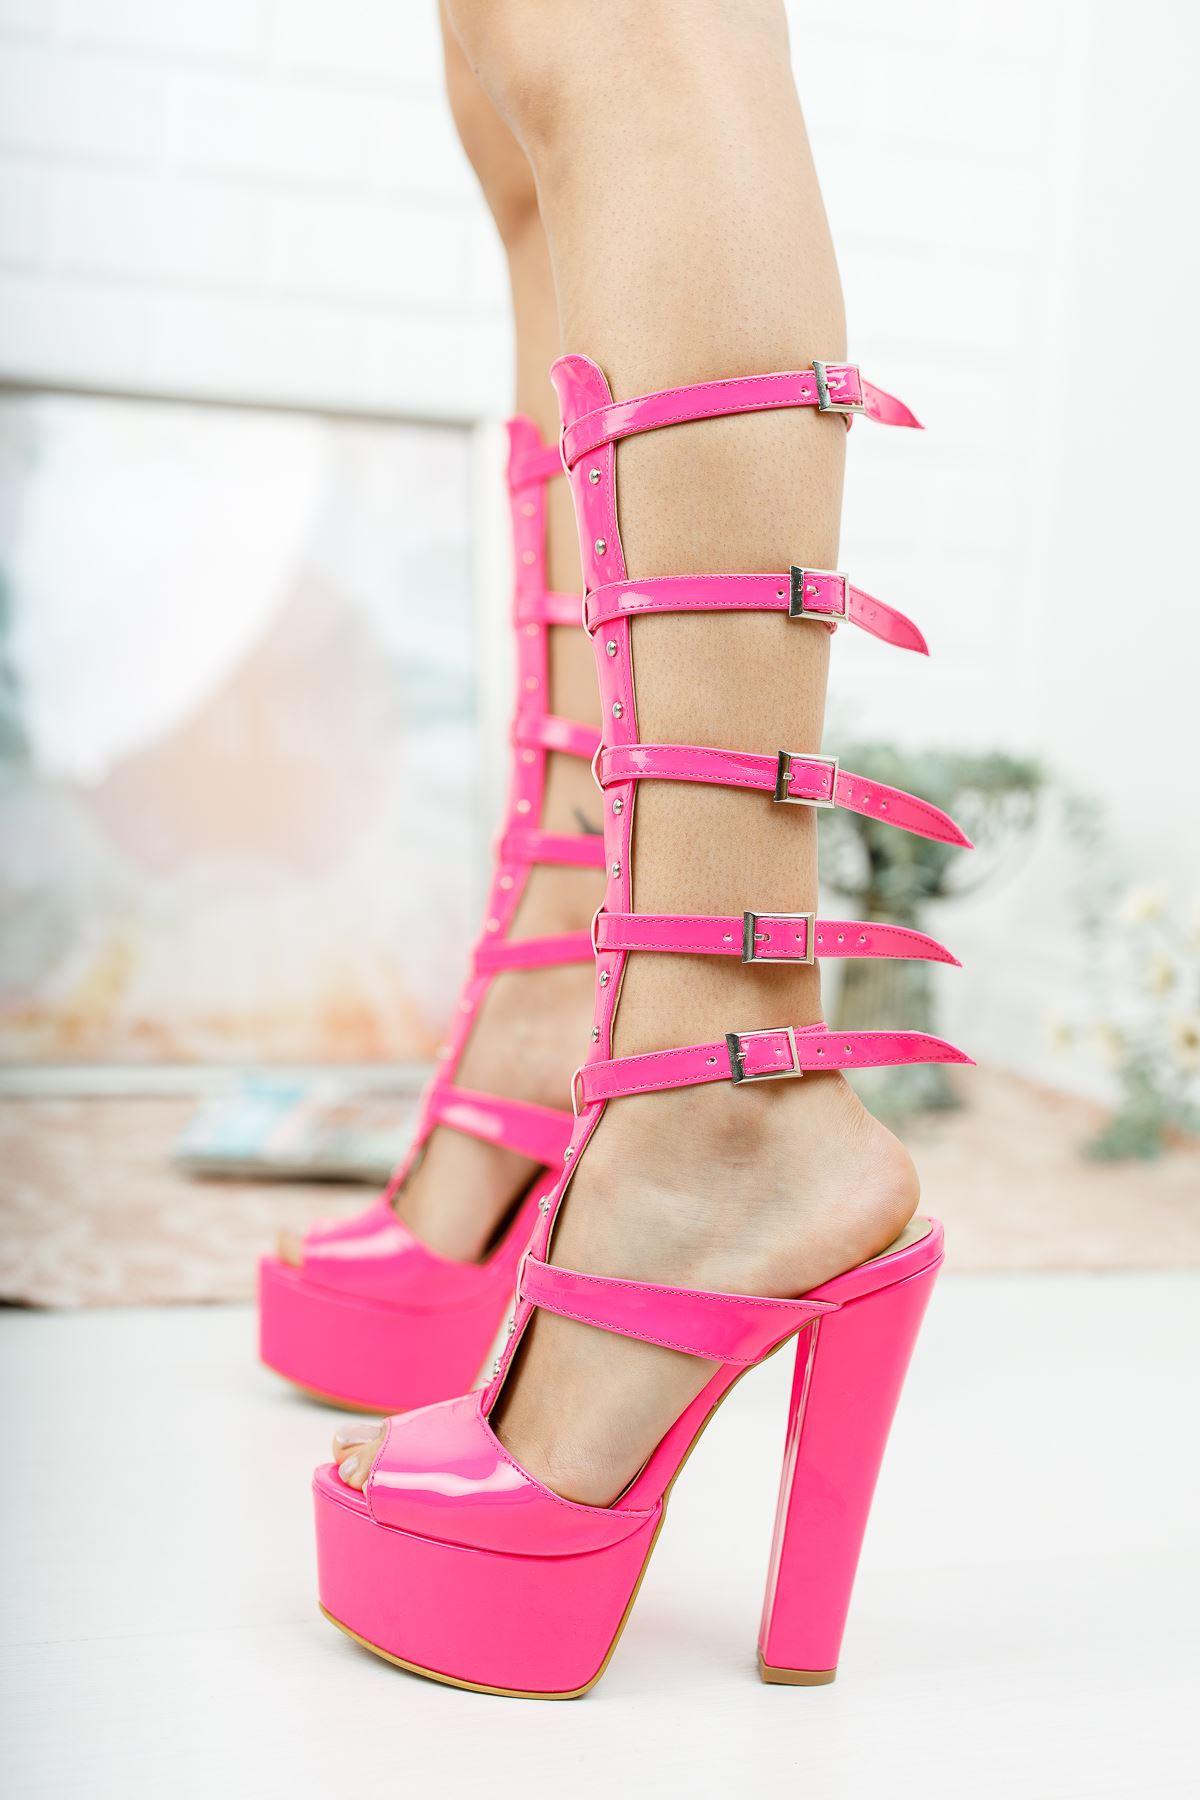 Lesvas Pembe Rugan Yüksek Topuklu Ayakkabı